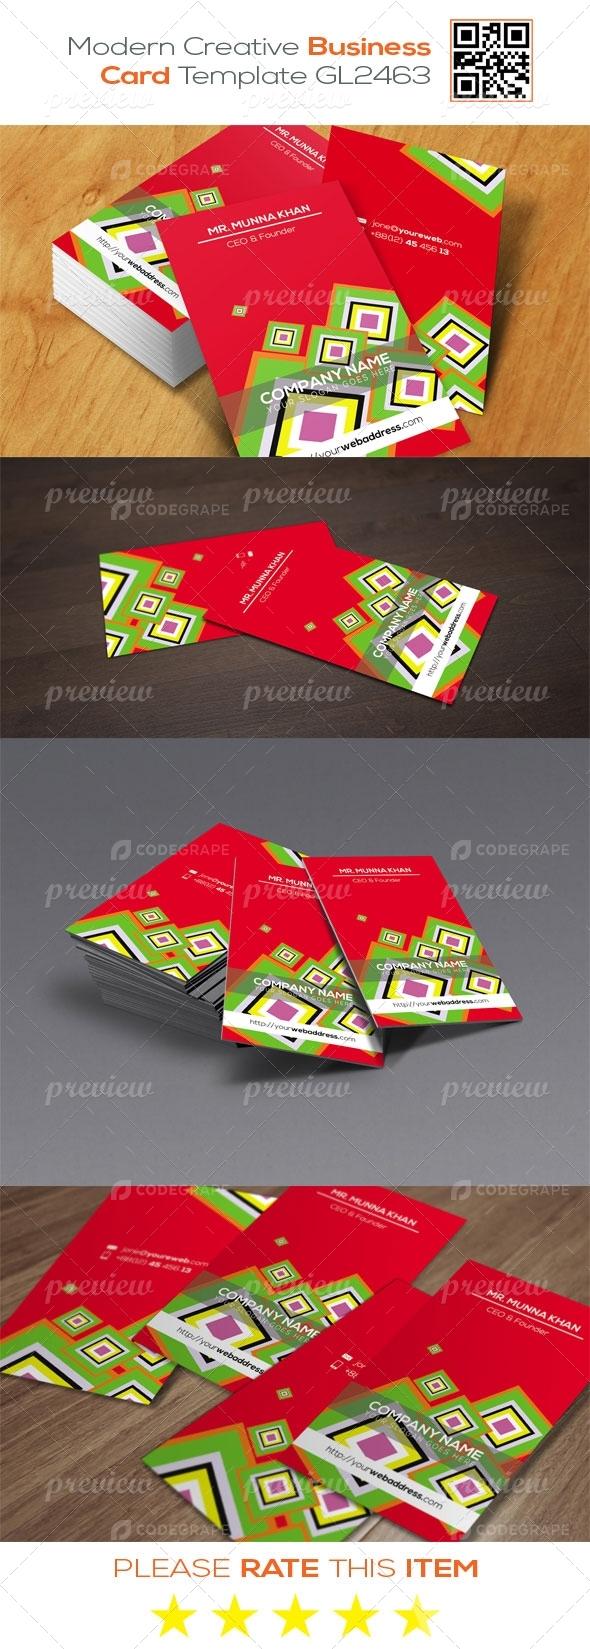 Modern Creative Business Card Template GL2463